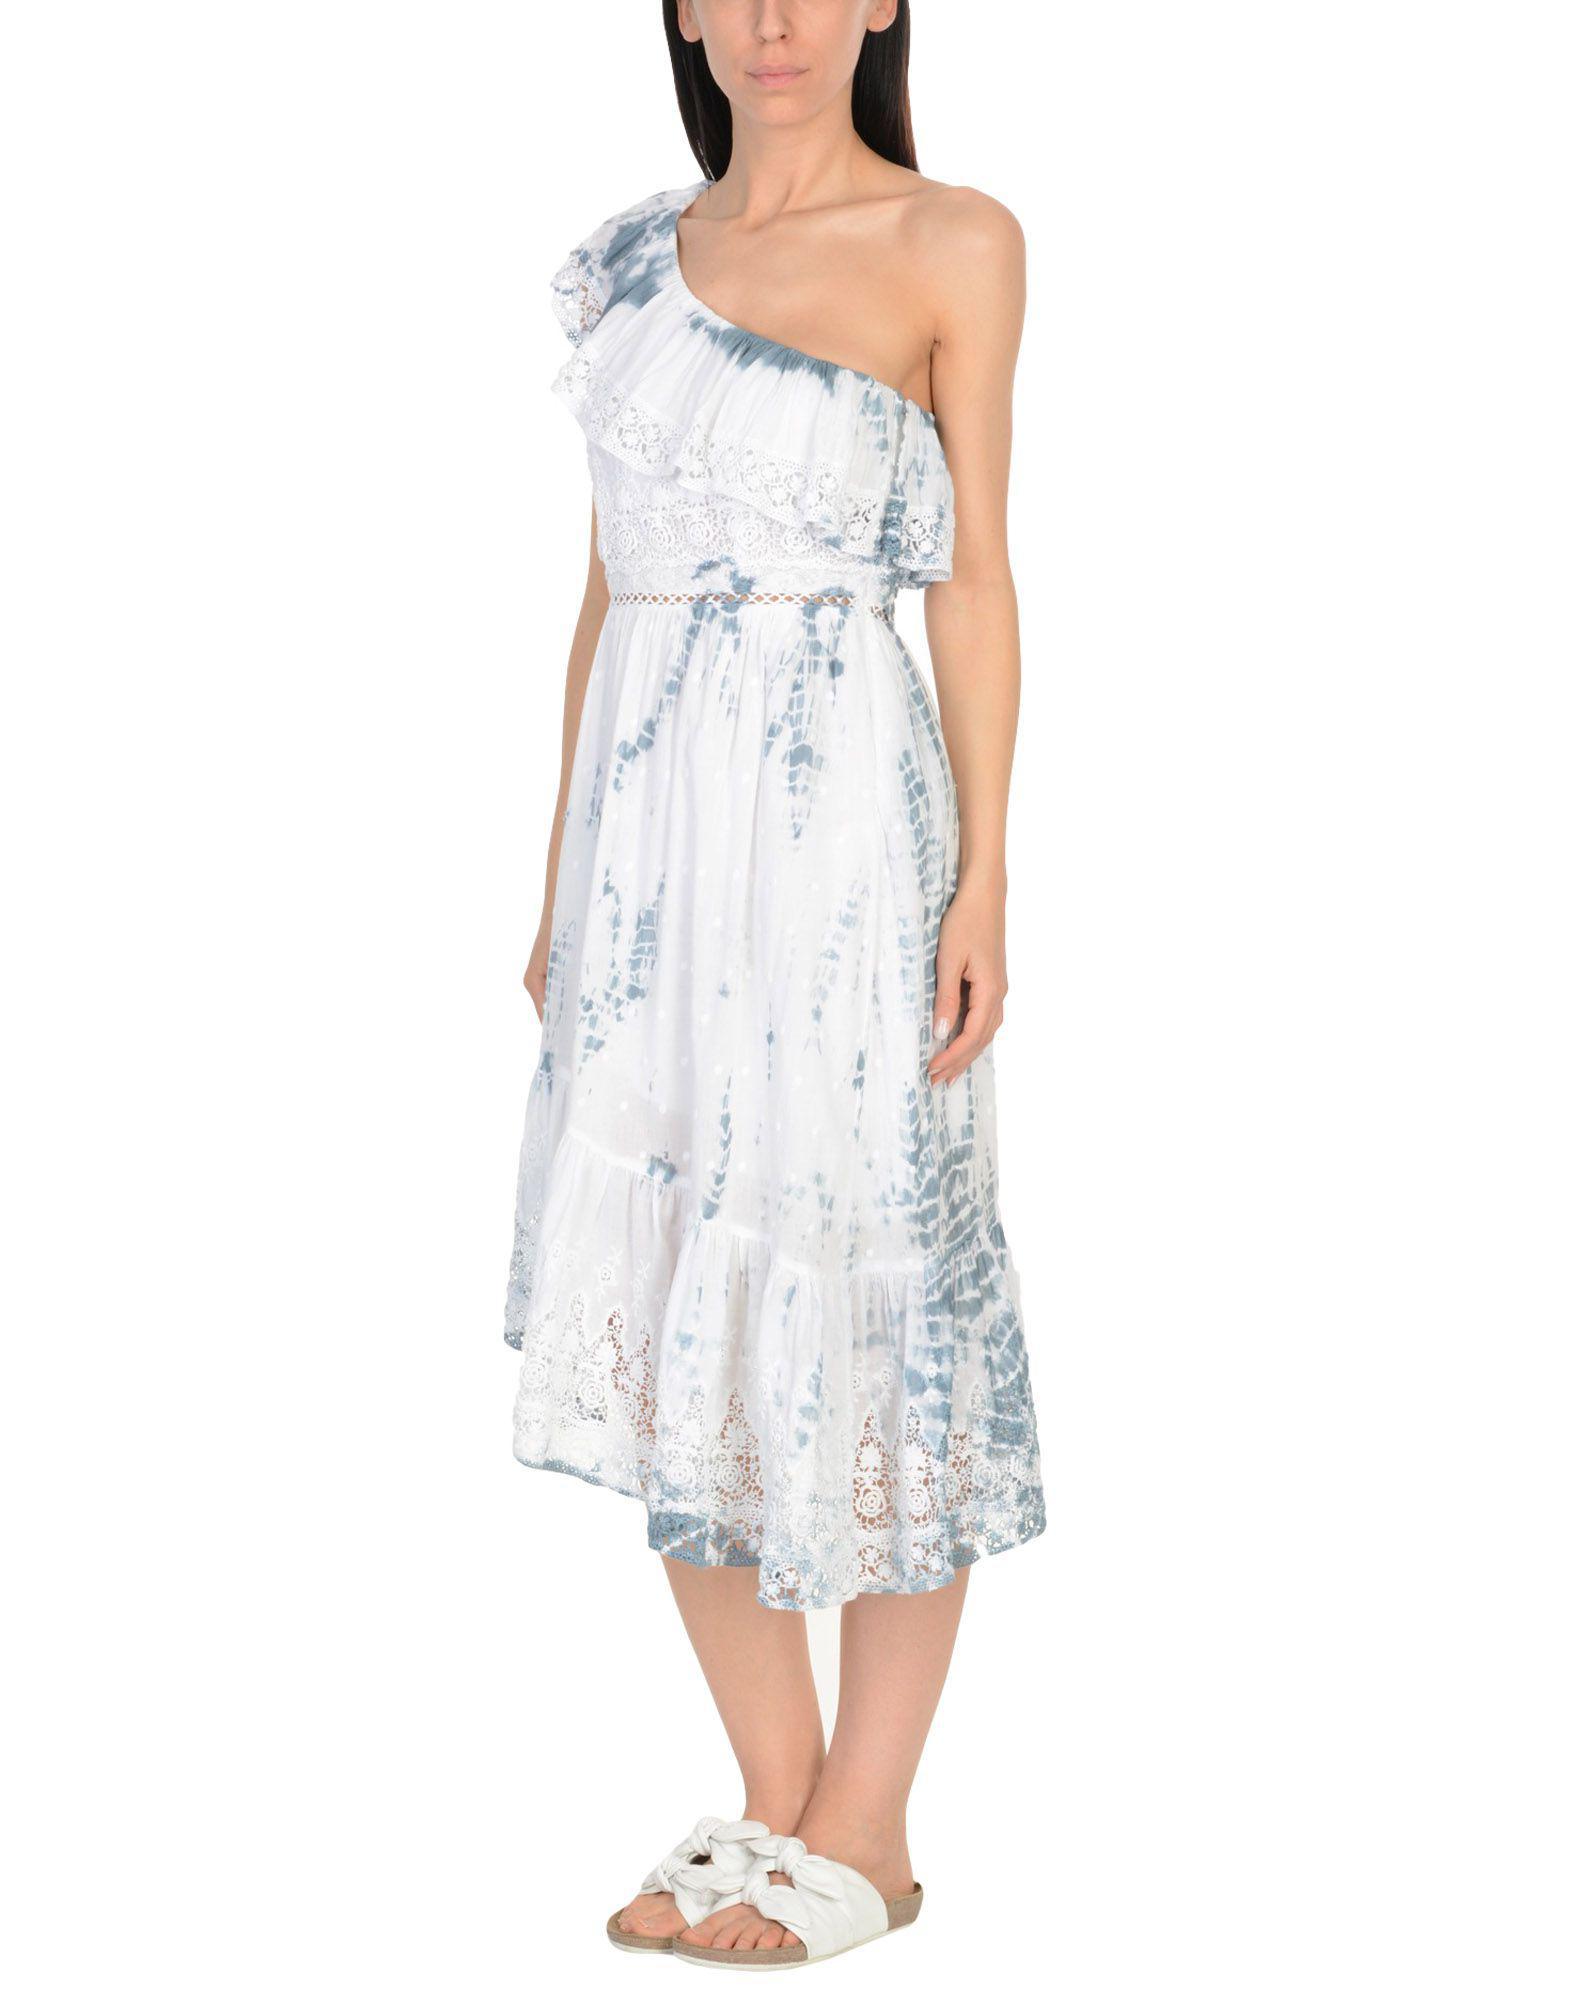 50a6fc8bd2 LoveShackFancy - White Beach Dress - Lyst. View fullscreen